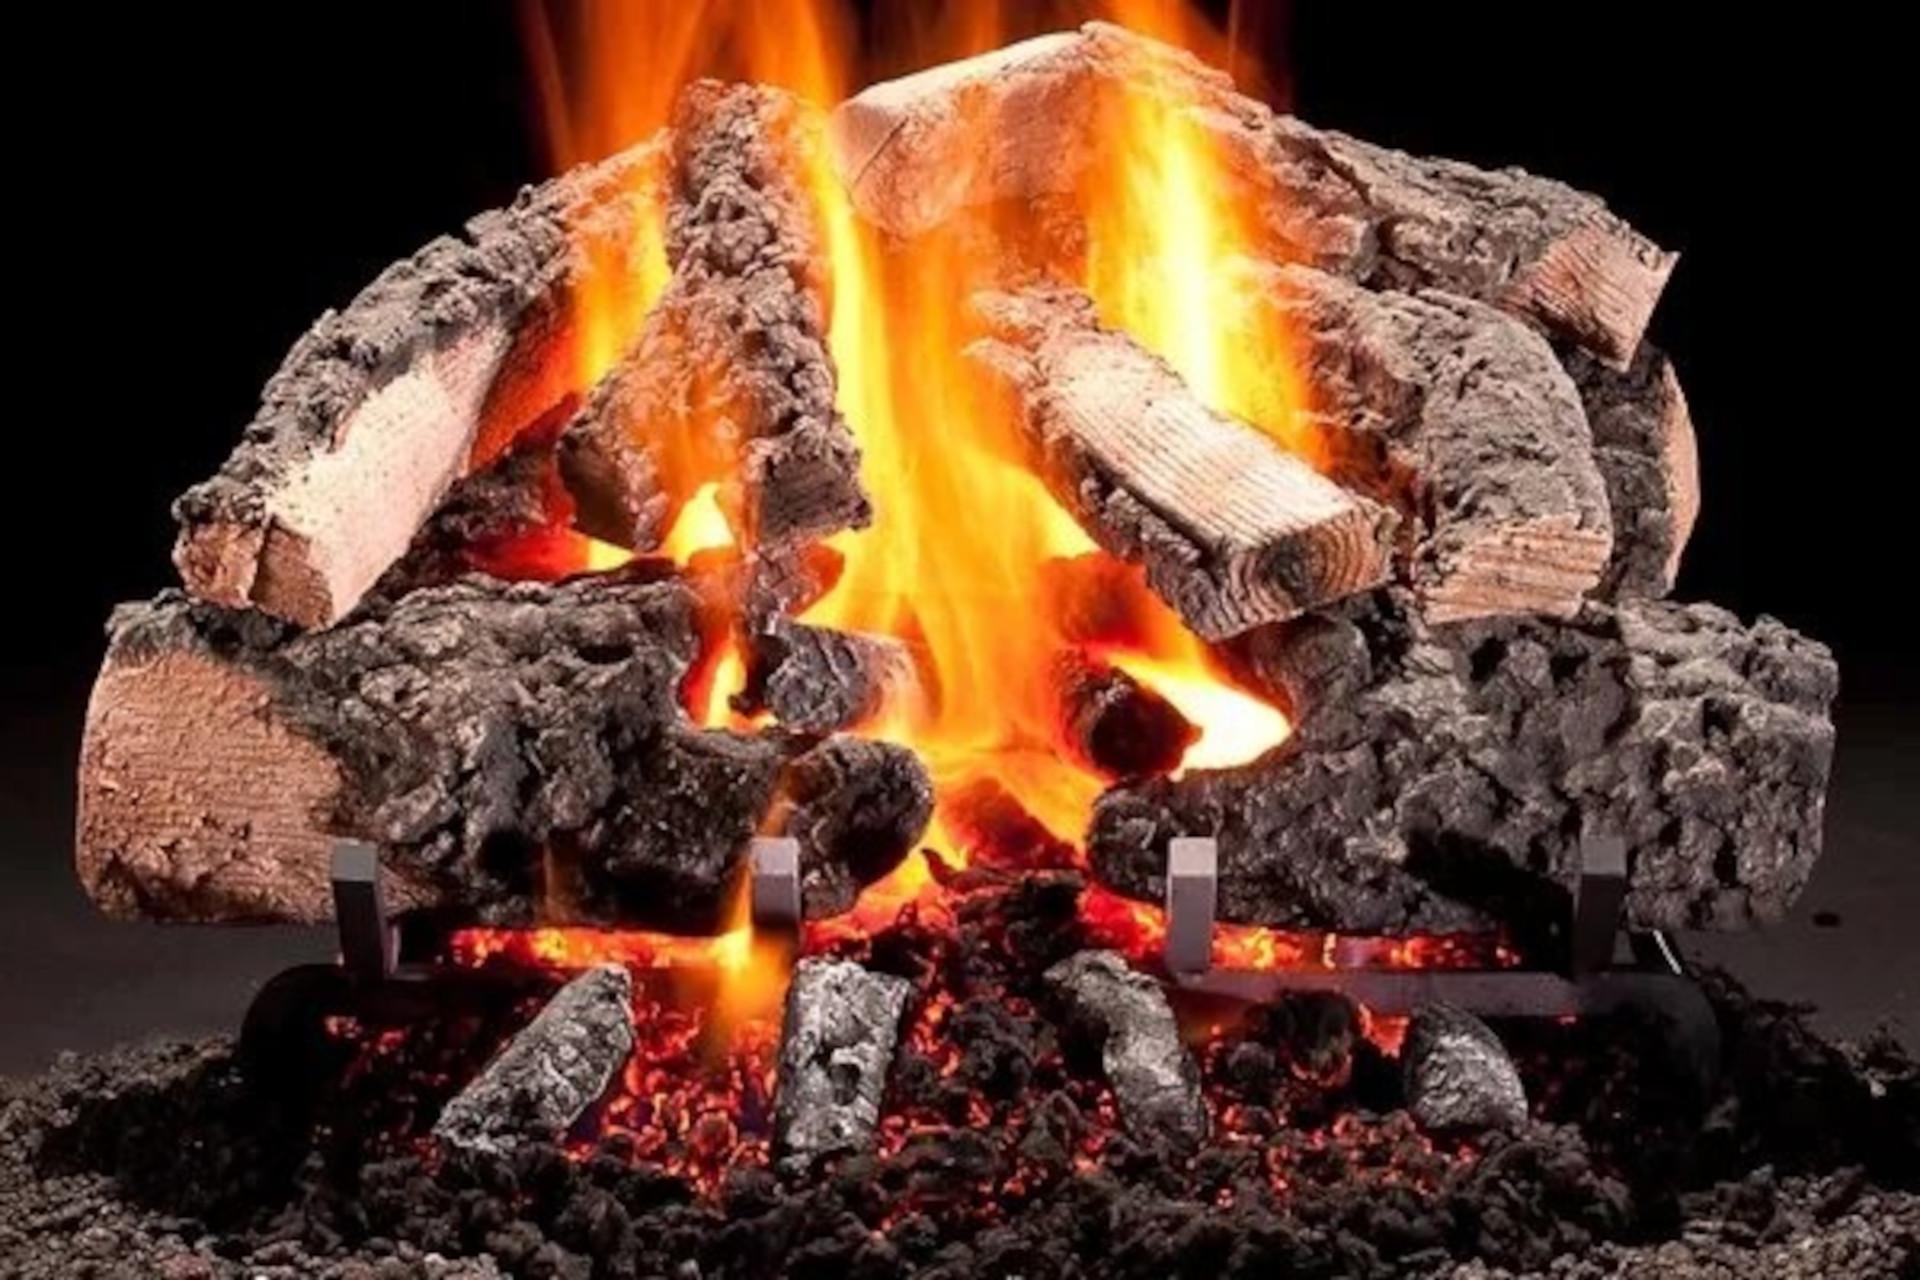 Hargrove Woodland Timbers Vented Gas Log Set